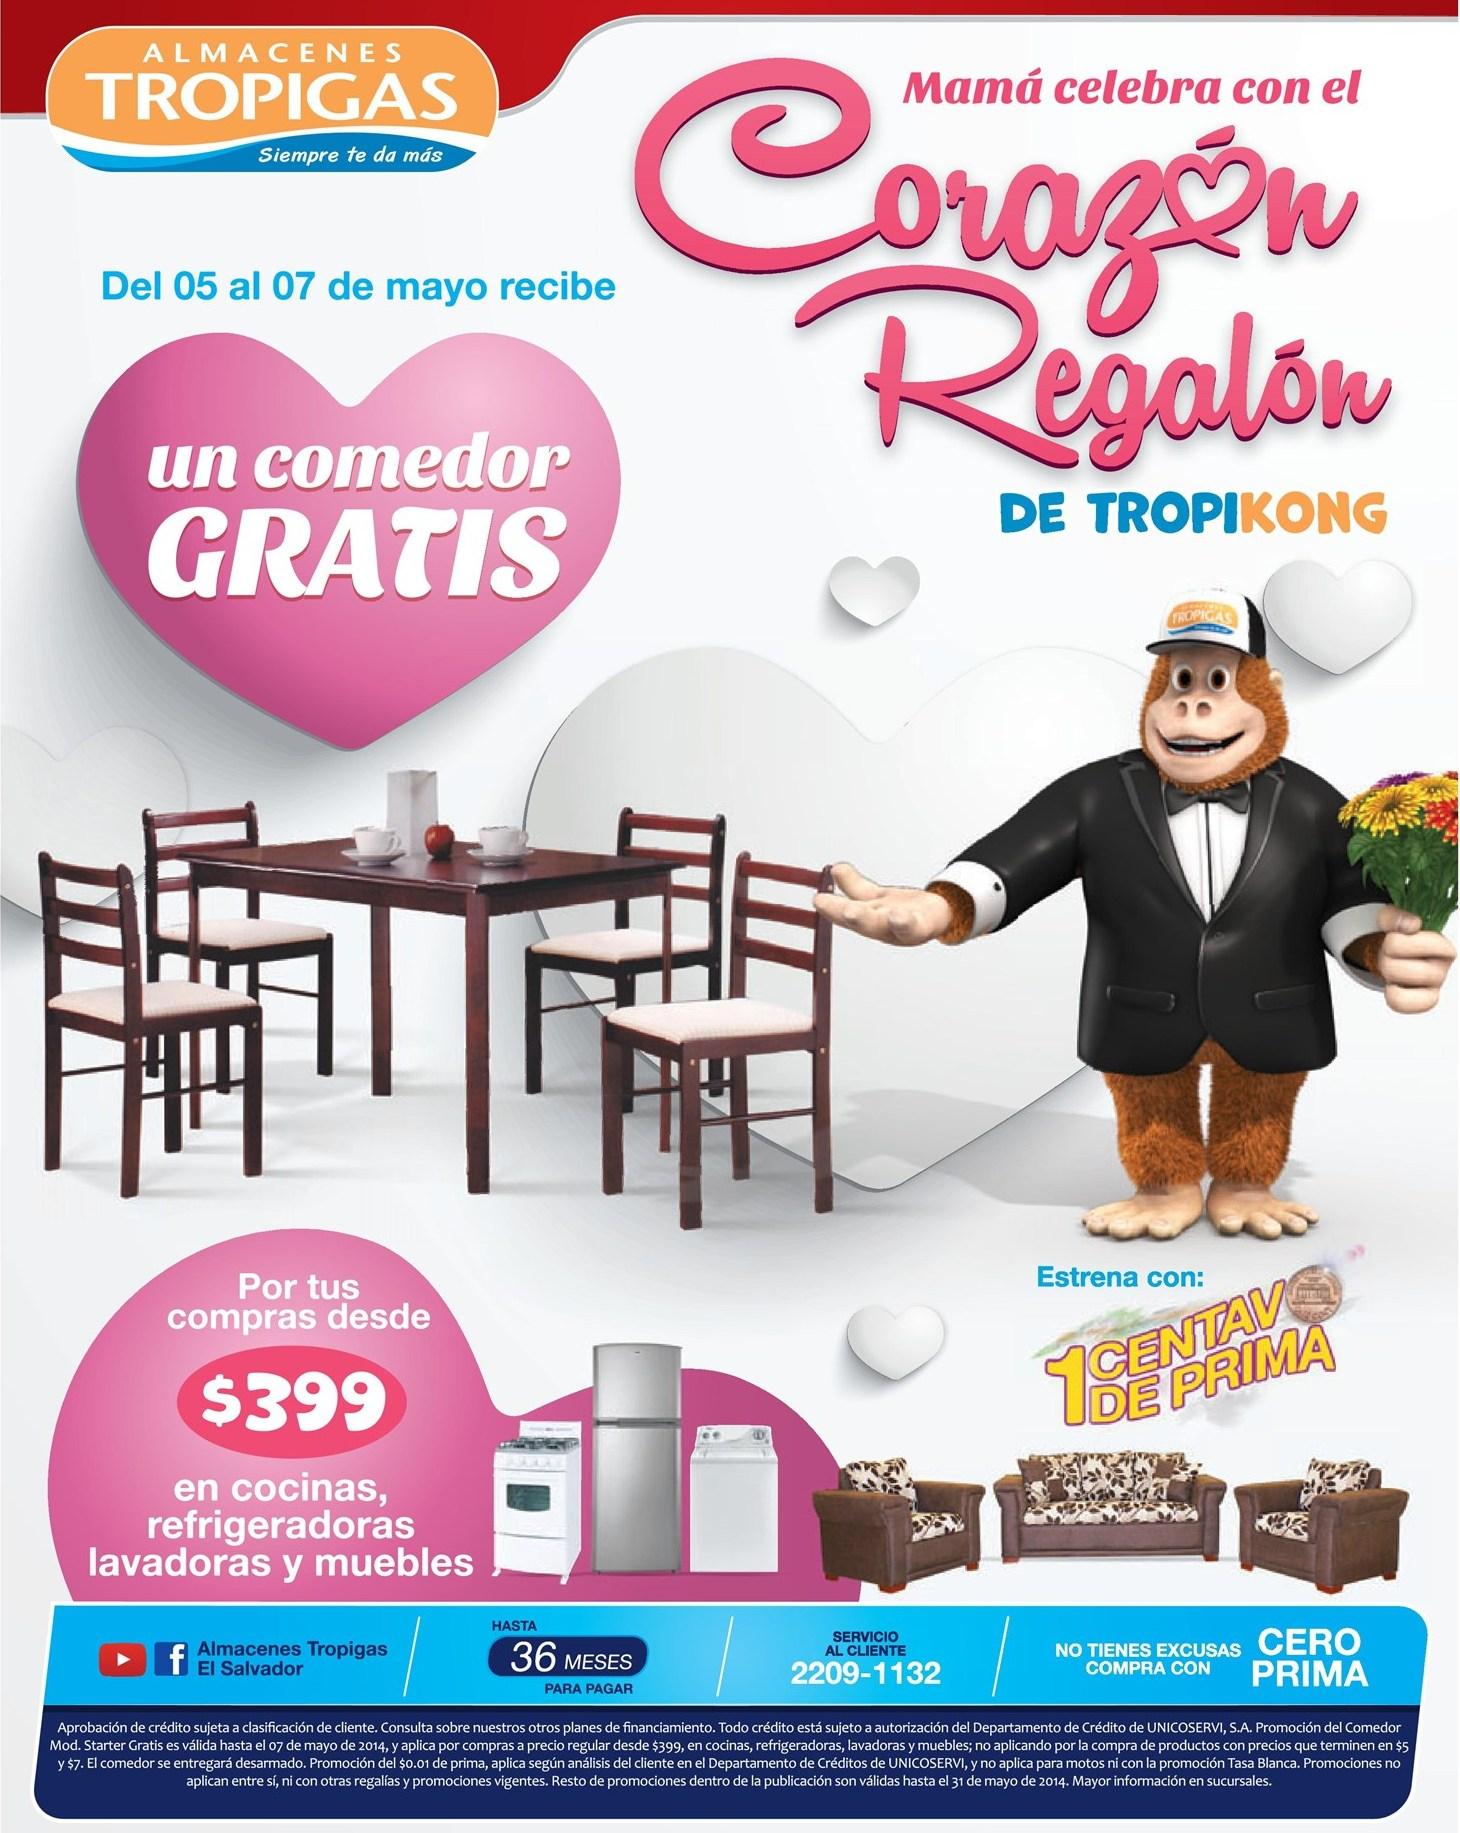 Juegos de comedor gratis celebra a mama tropigas 05may14 for Juego de comedor oferta